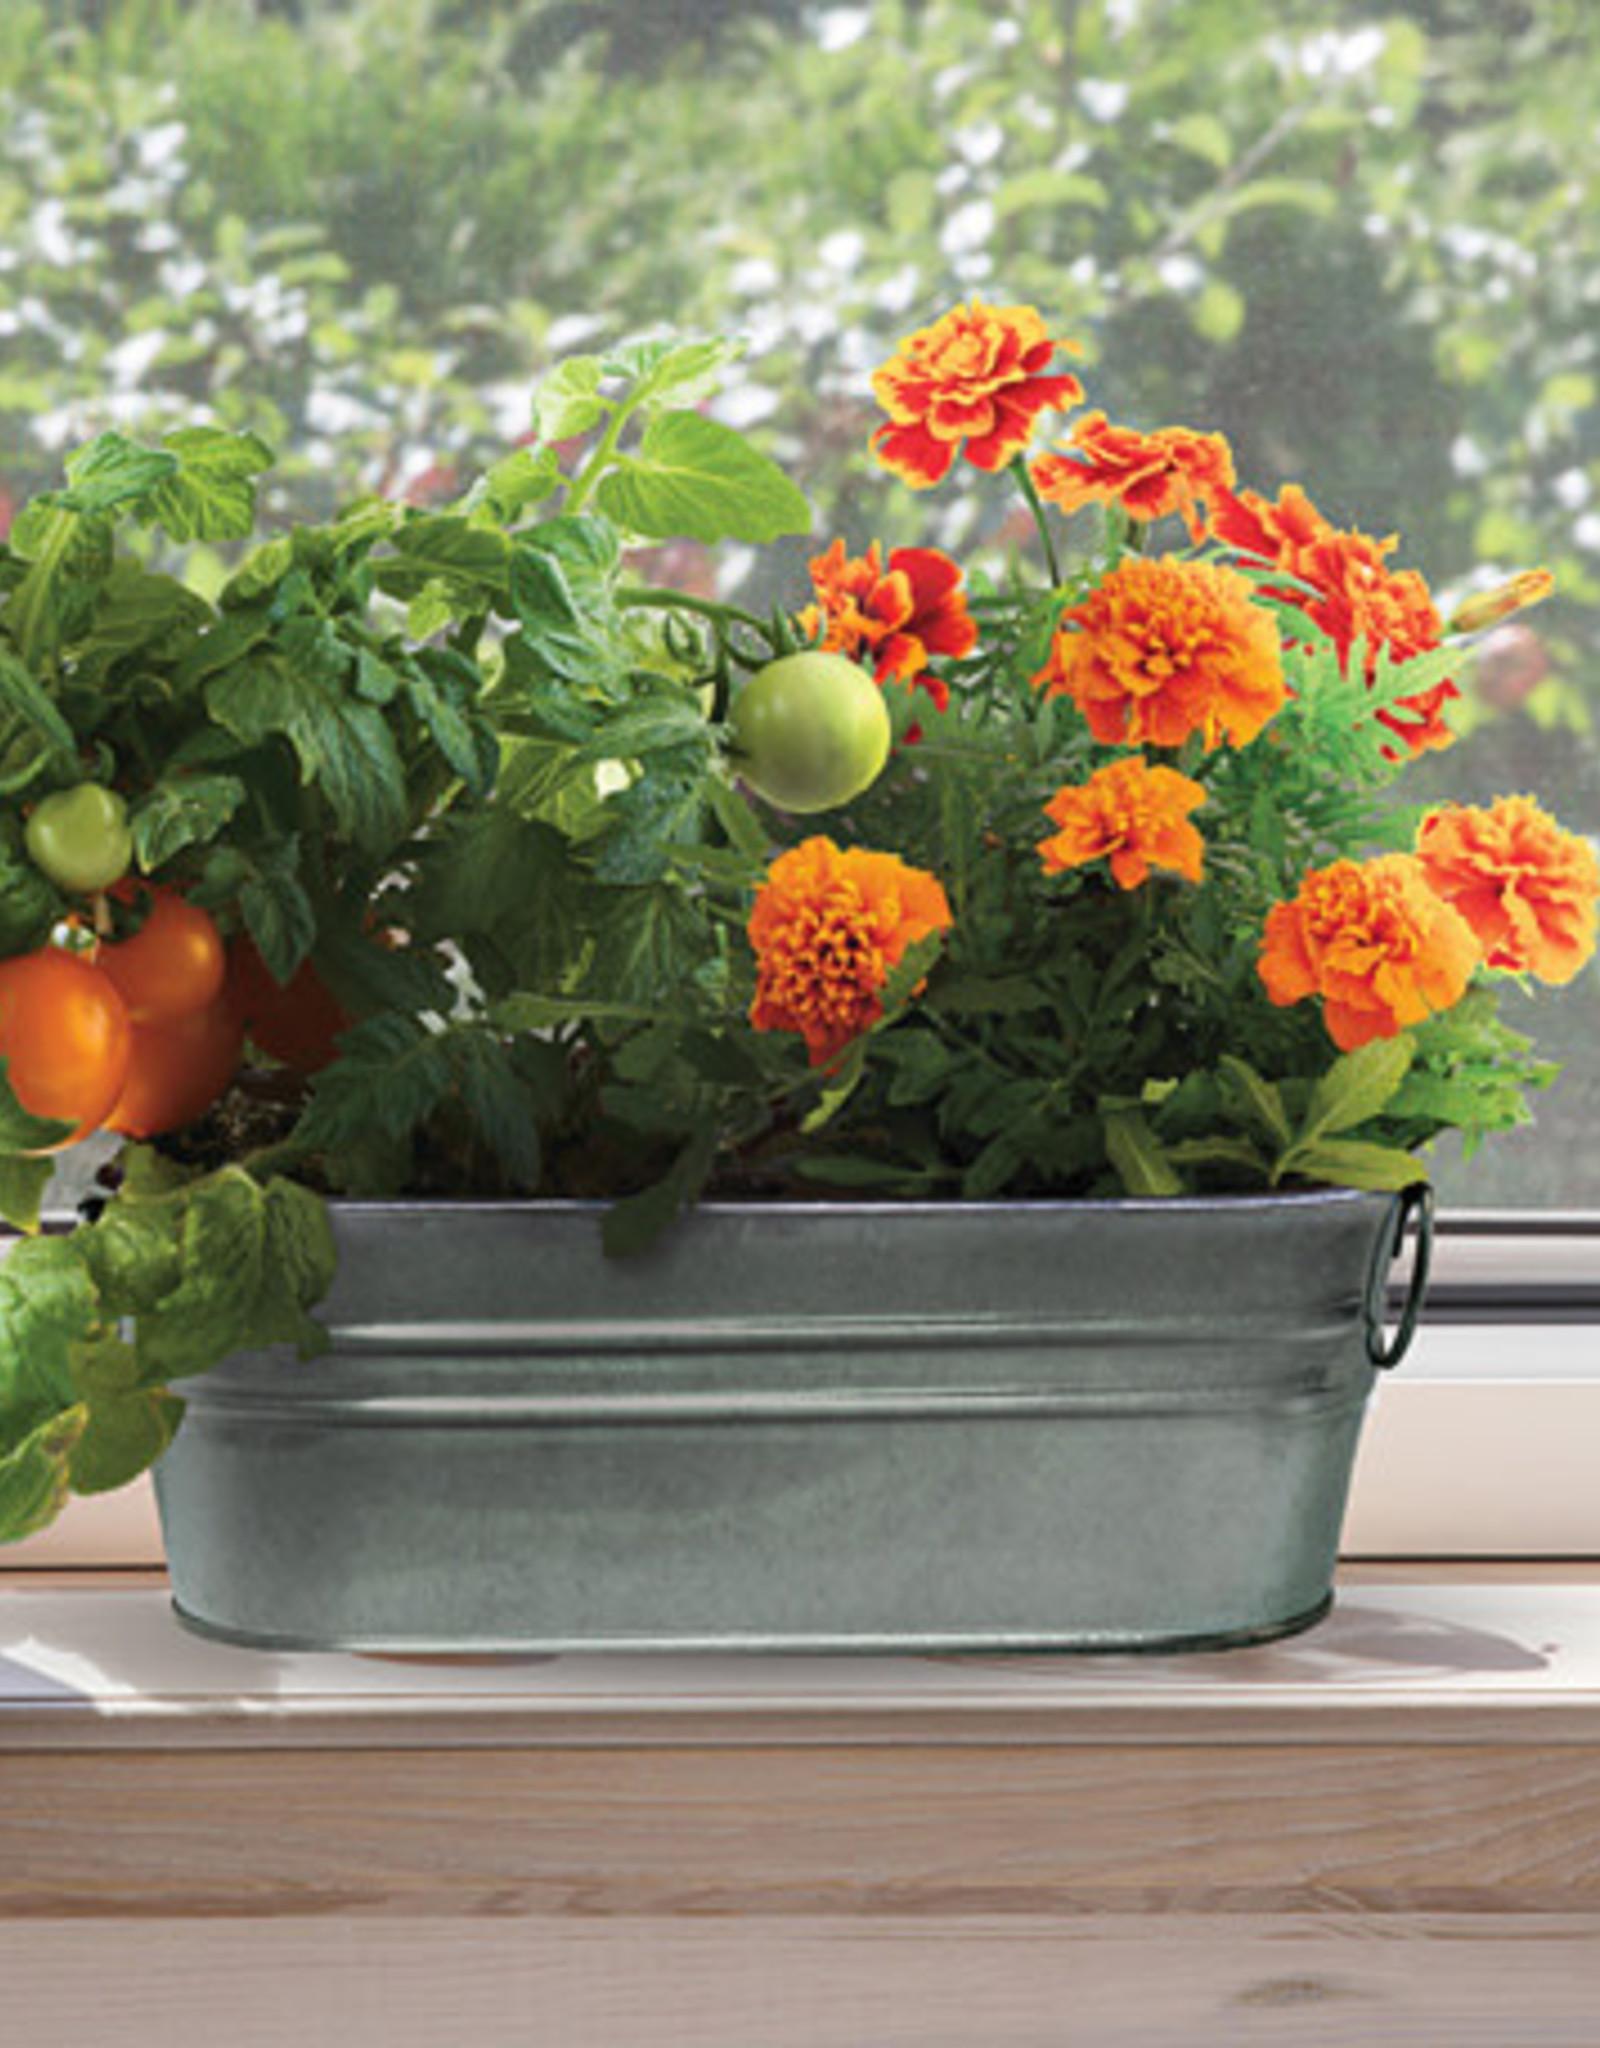 My First Garden Windowsill Grow Kit